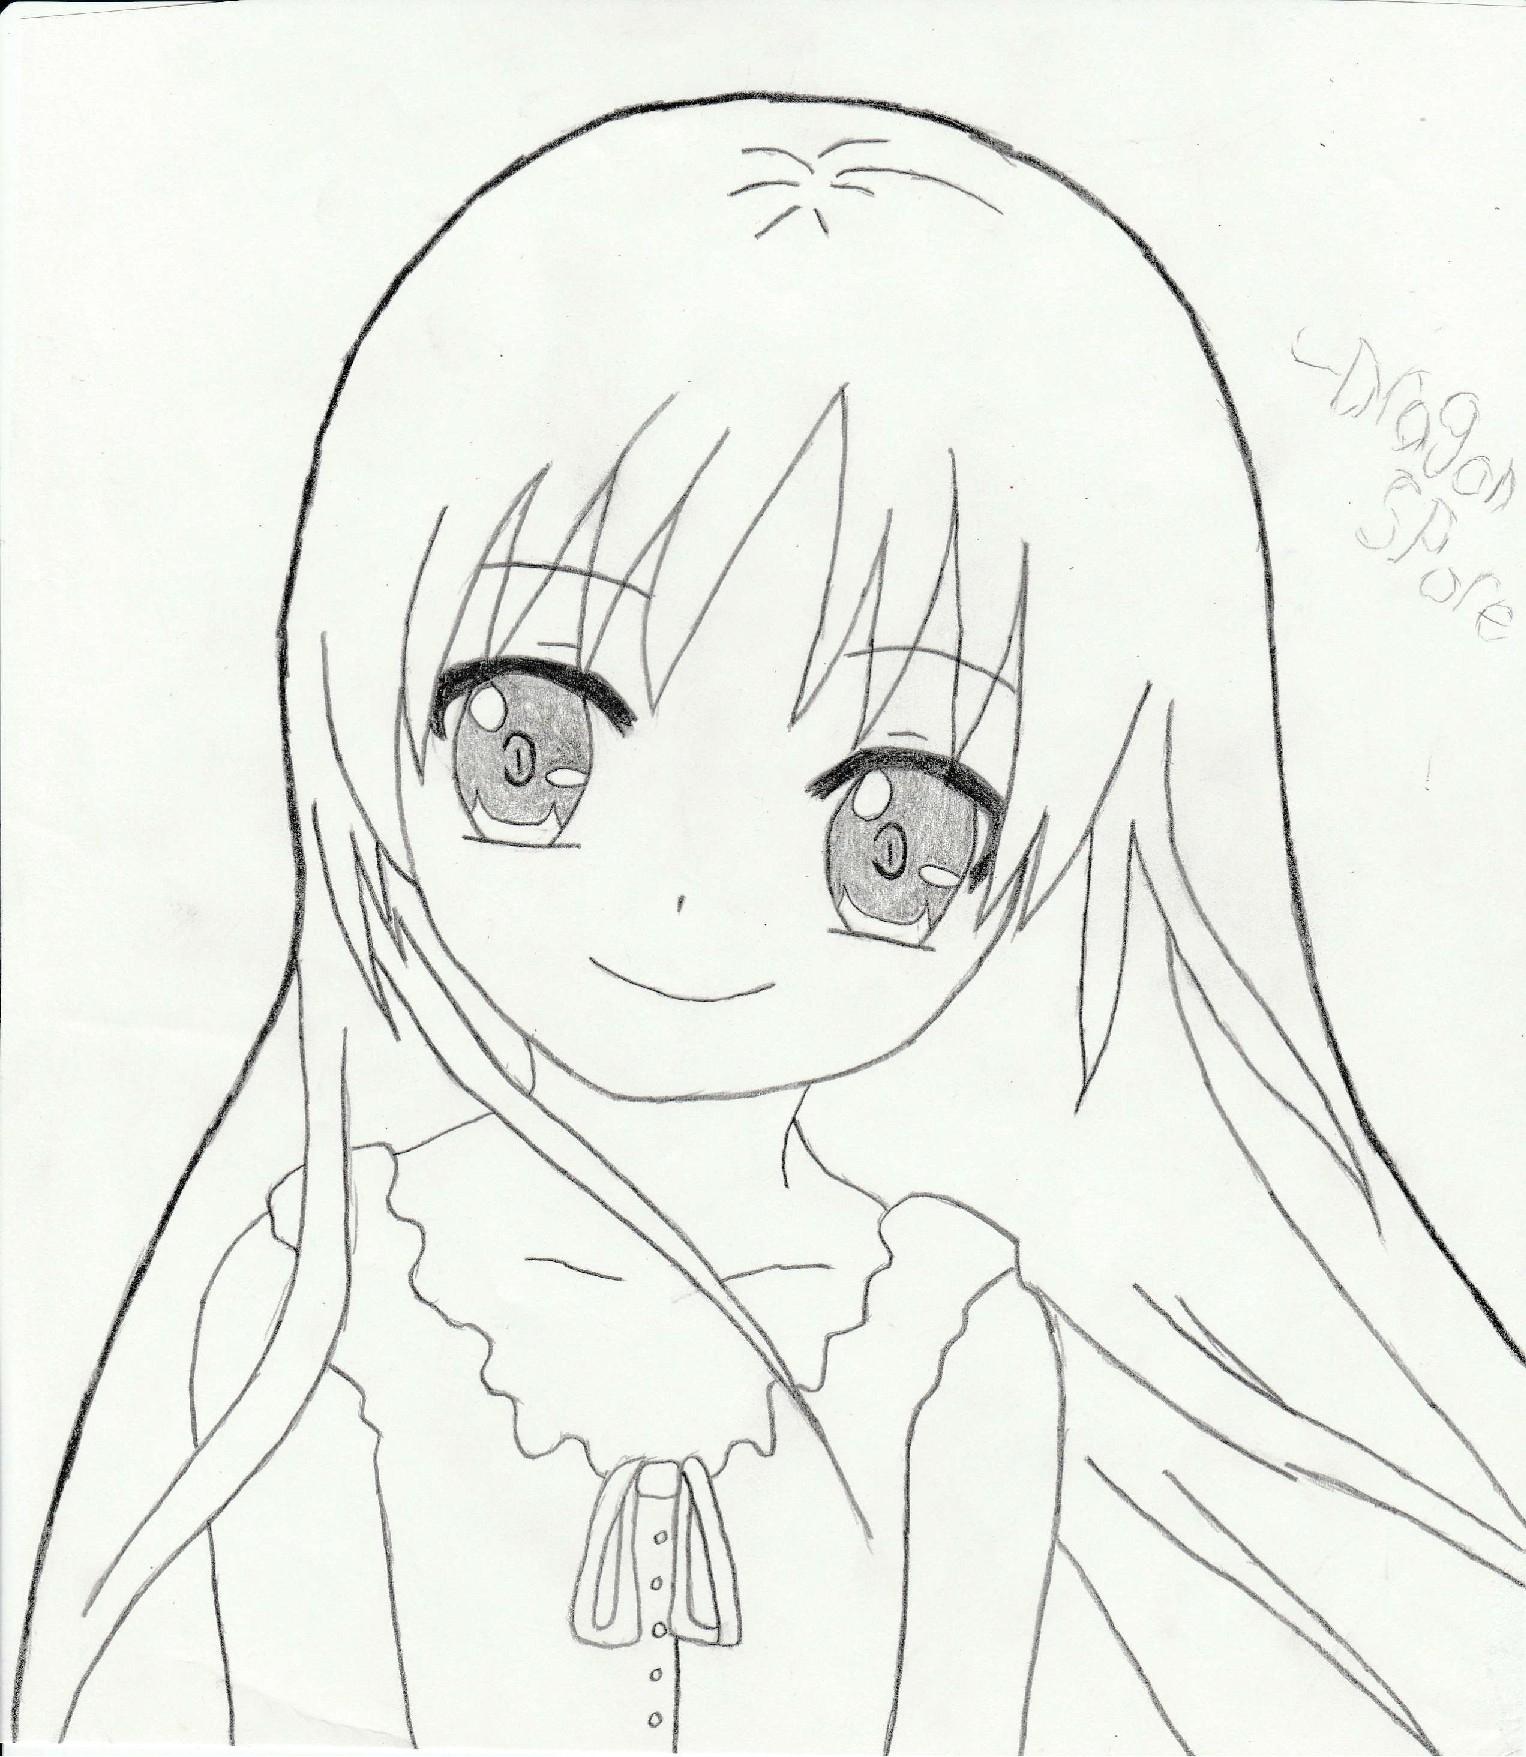 Sad Anime Girl Drawing at GetDrawings | Free download